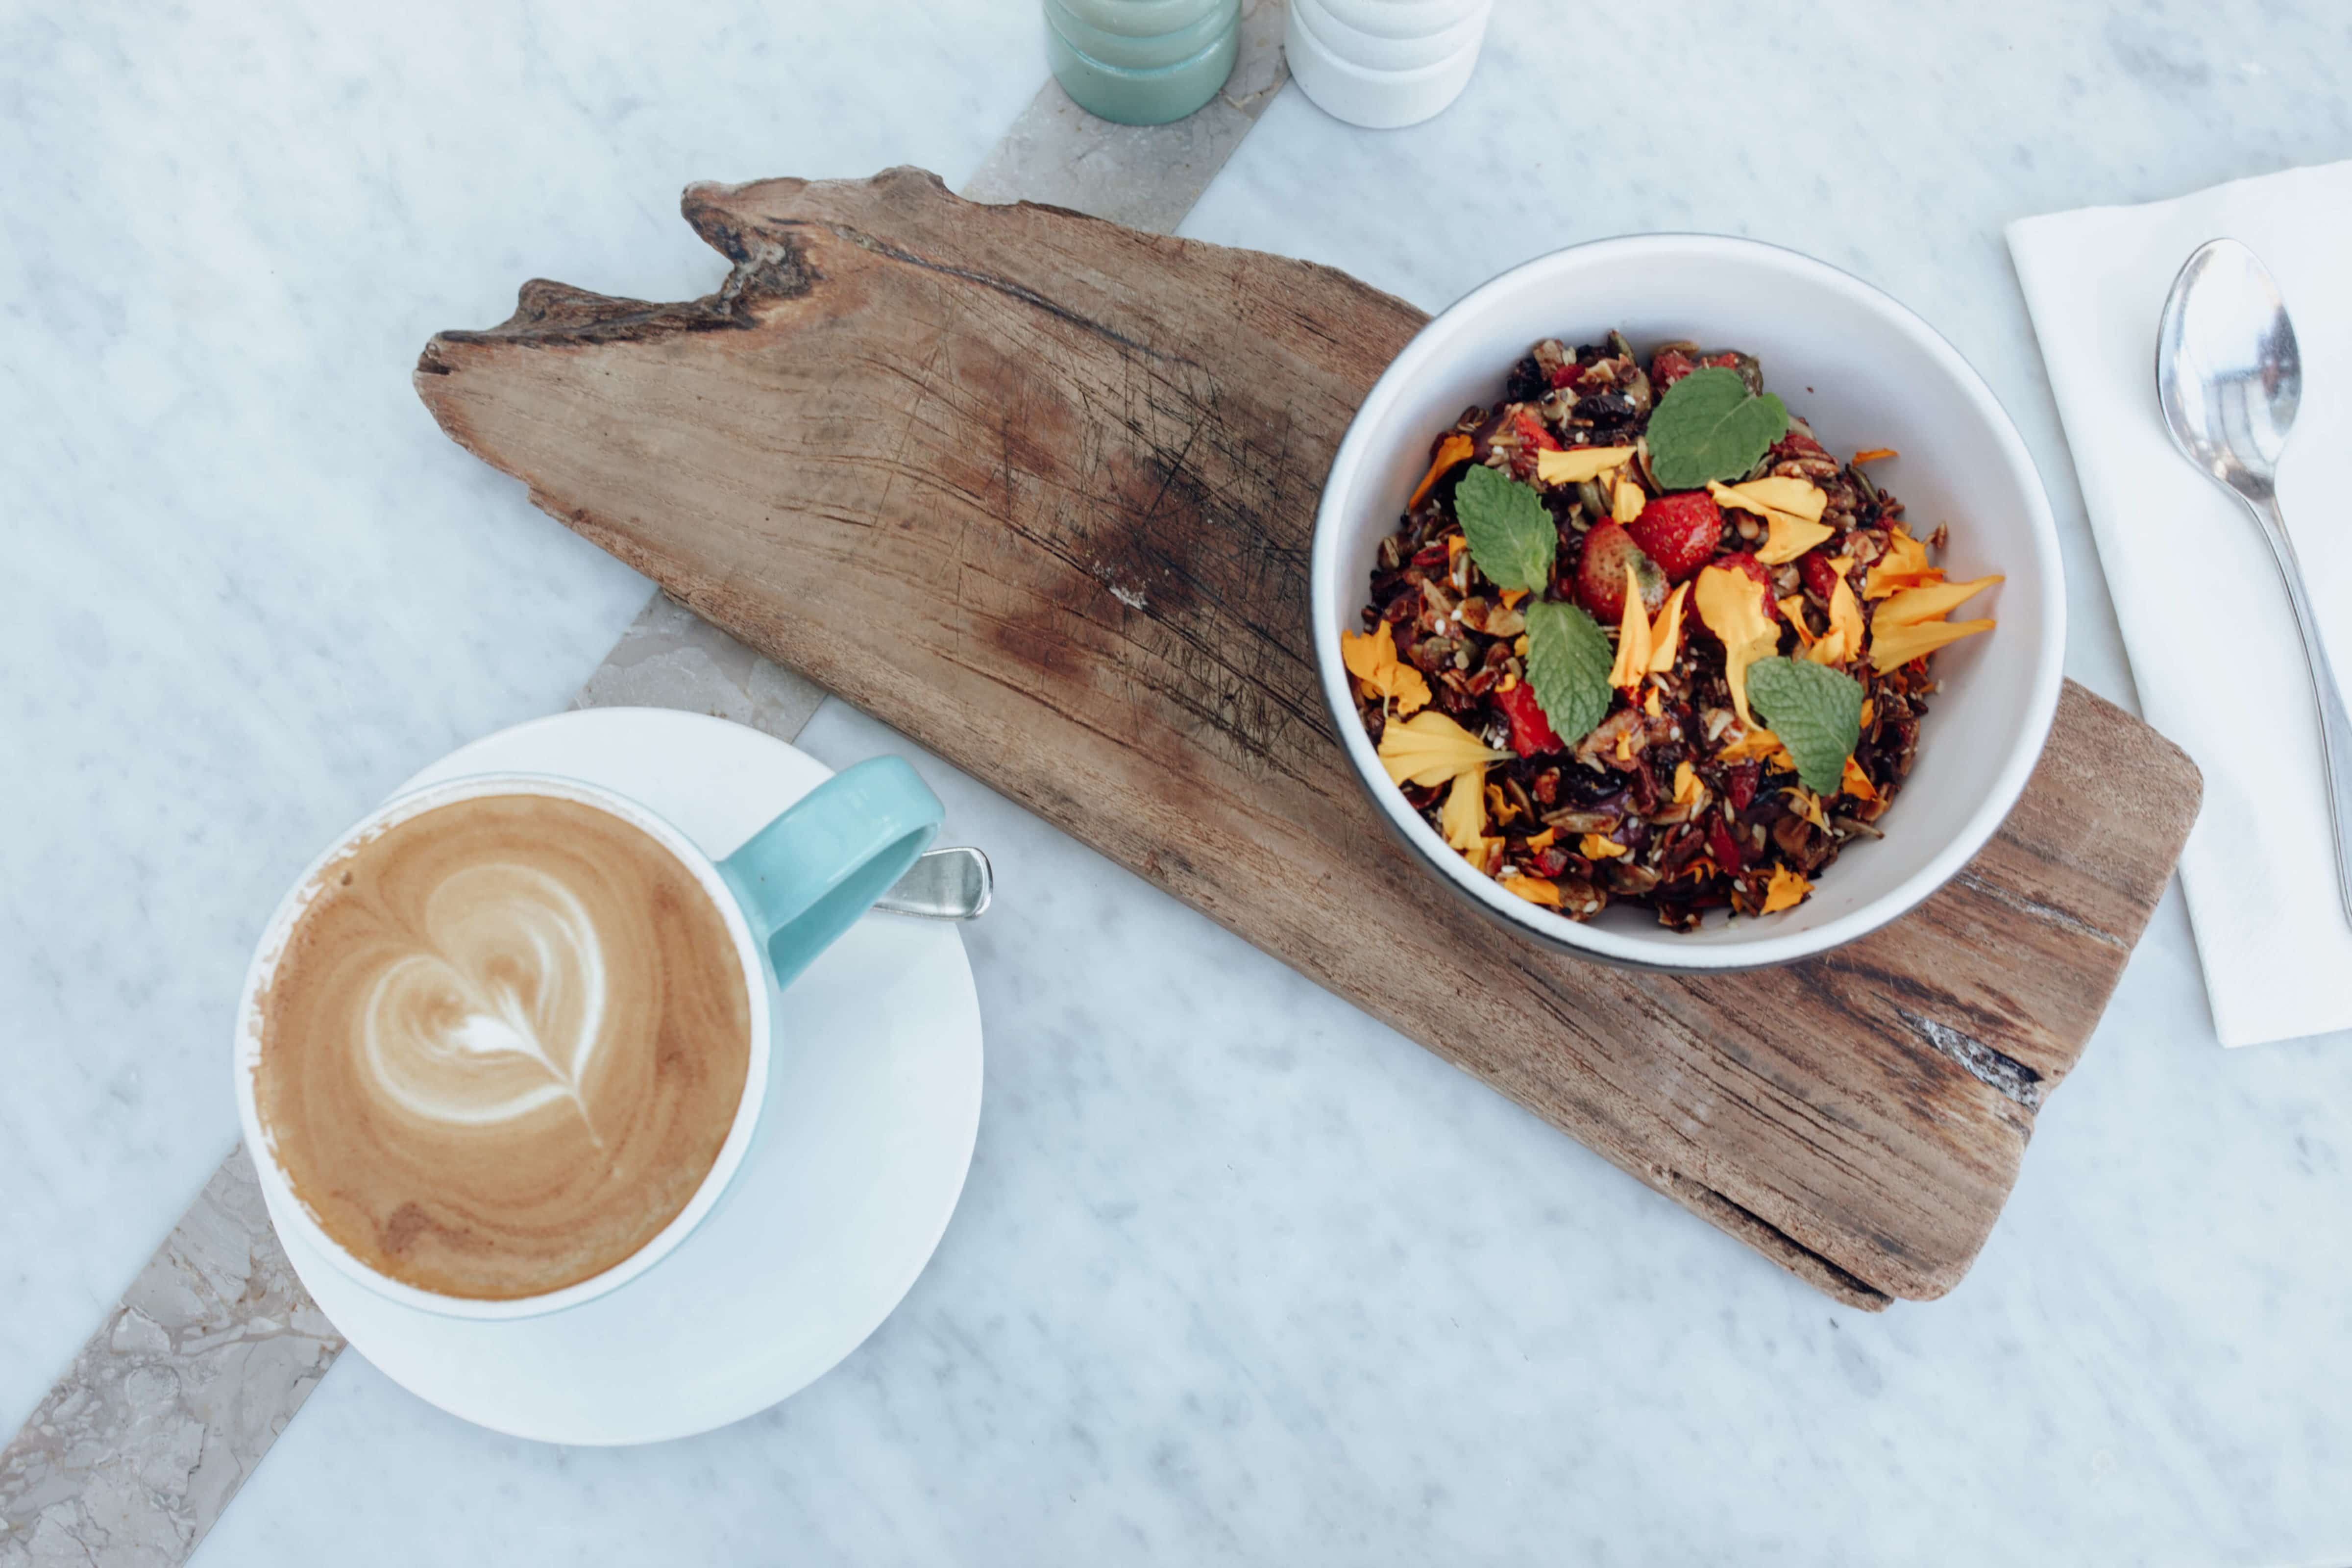 Travel photography Bali - Breakfast - Latte - Bowl - Food